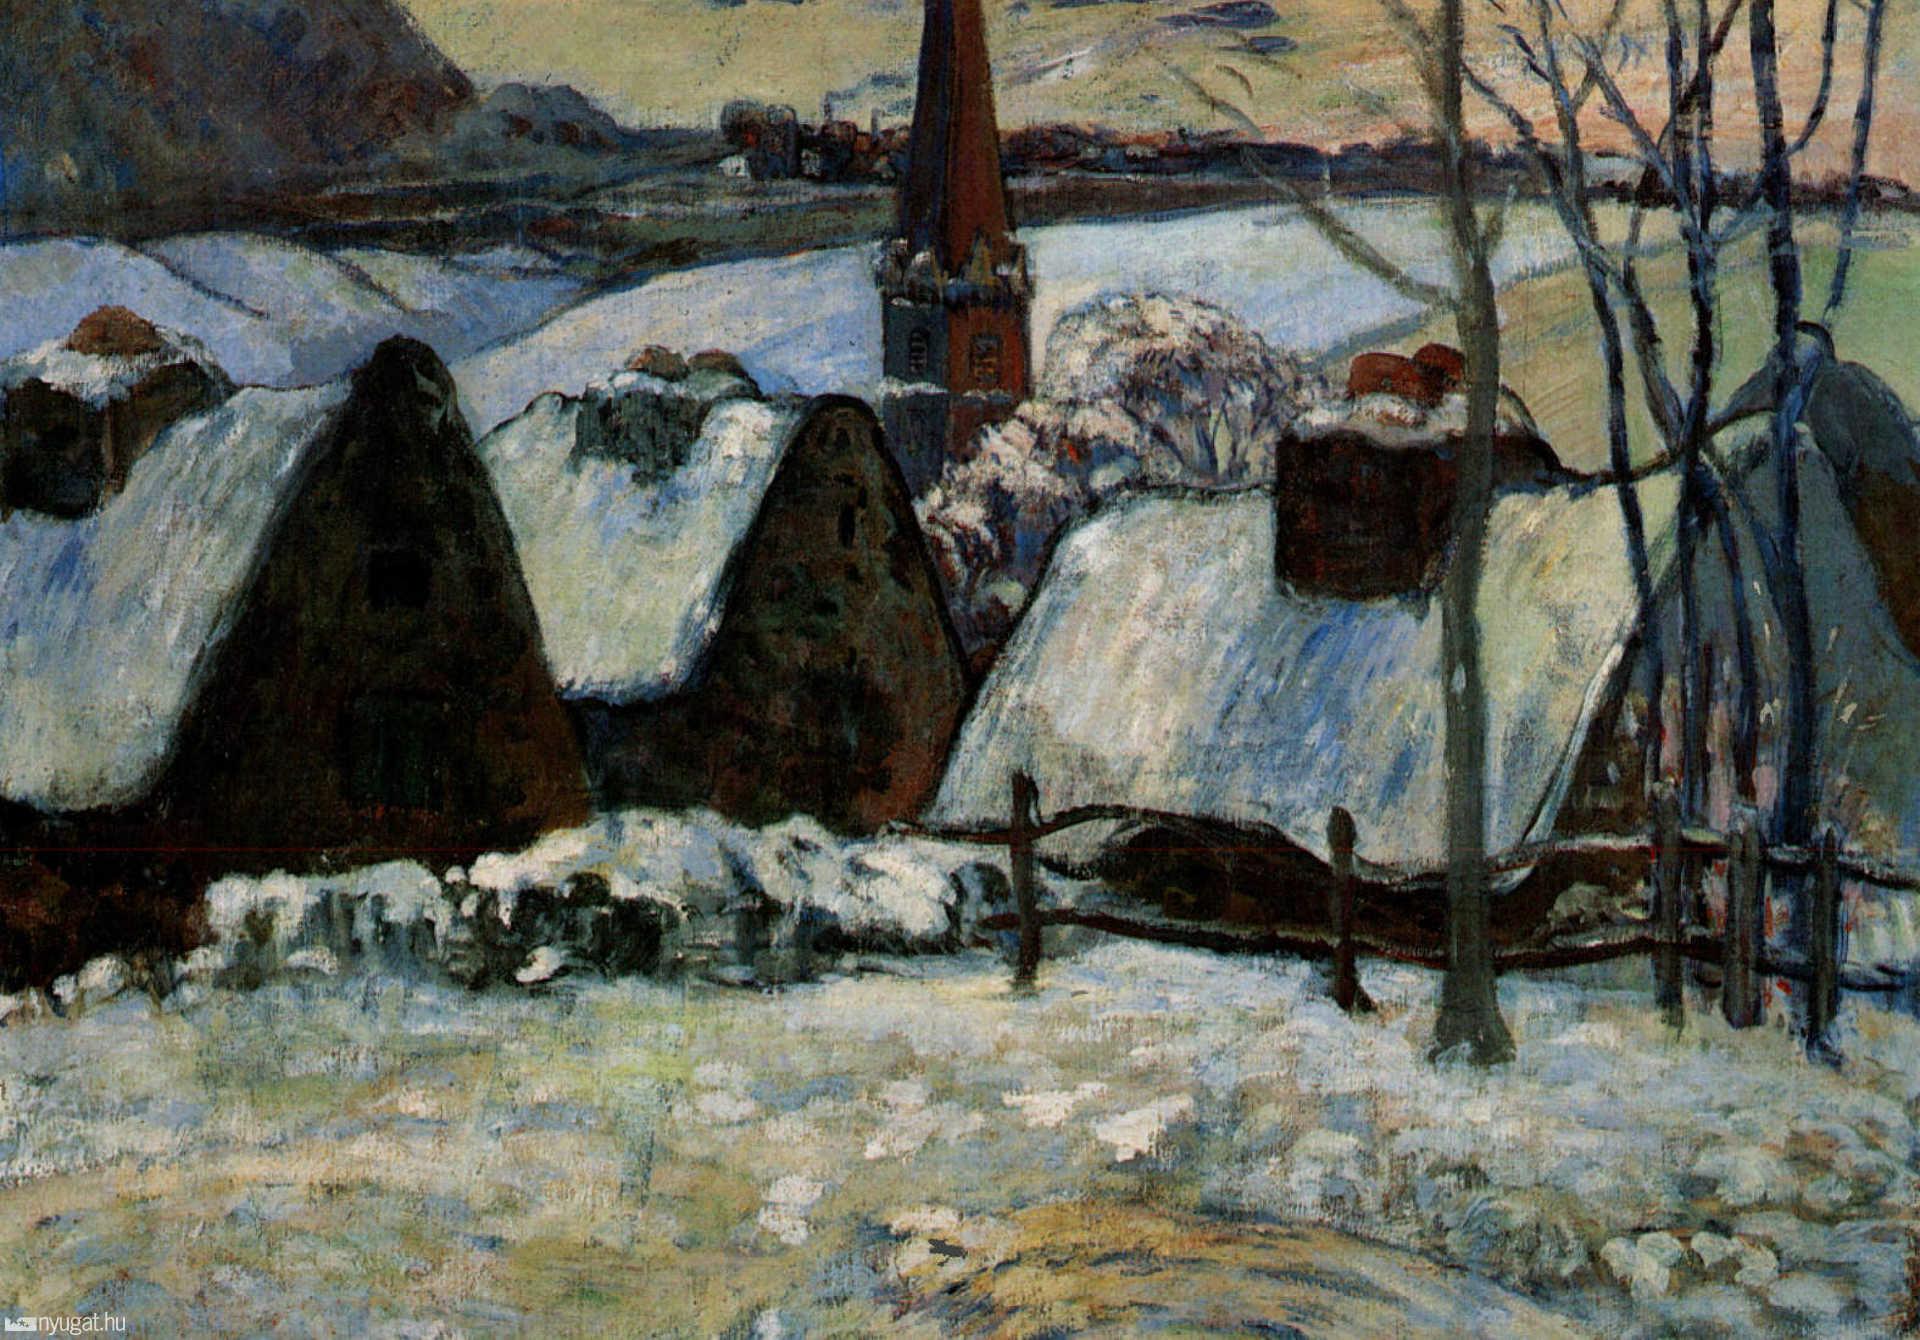 Paul Gauguin: Breton Village in the Snow (1894.)